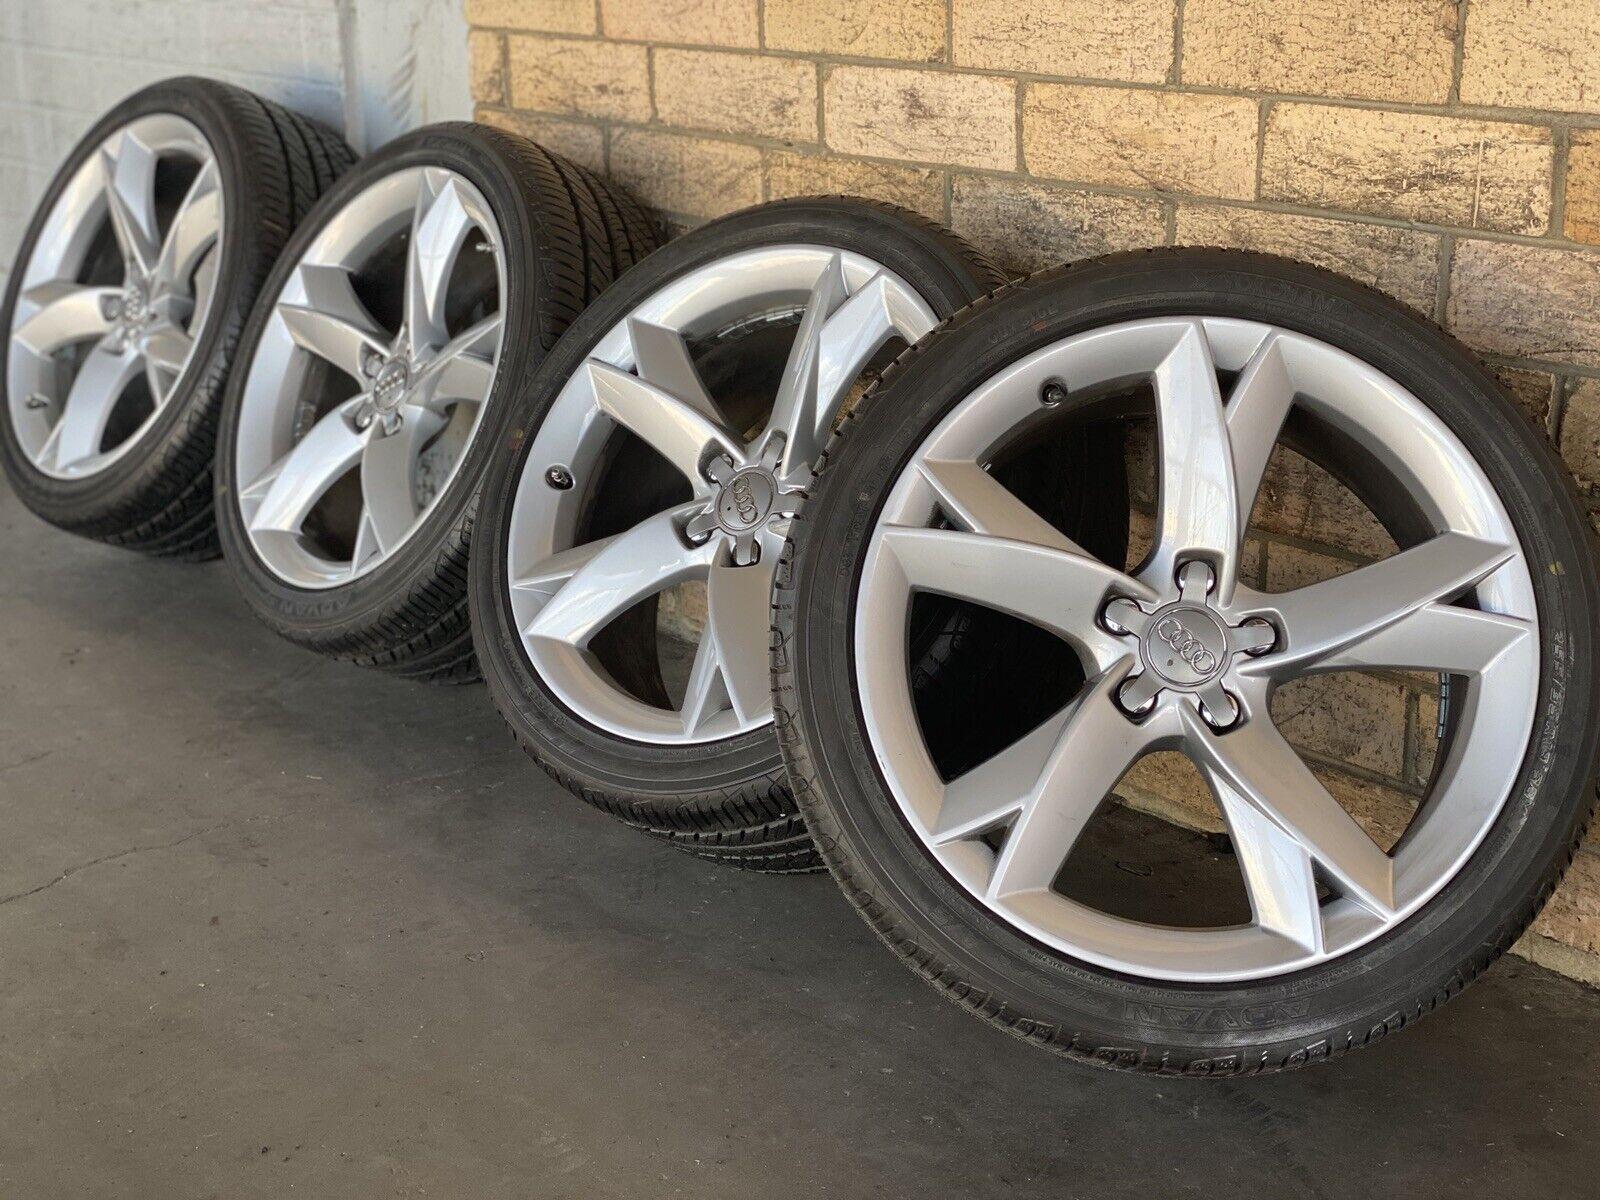 4x Genuine Audi A5 Y Shape Speedline Alloy Wheels 19 With Good Tyres For Sale Online Ebay